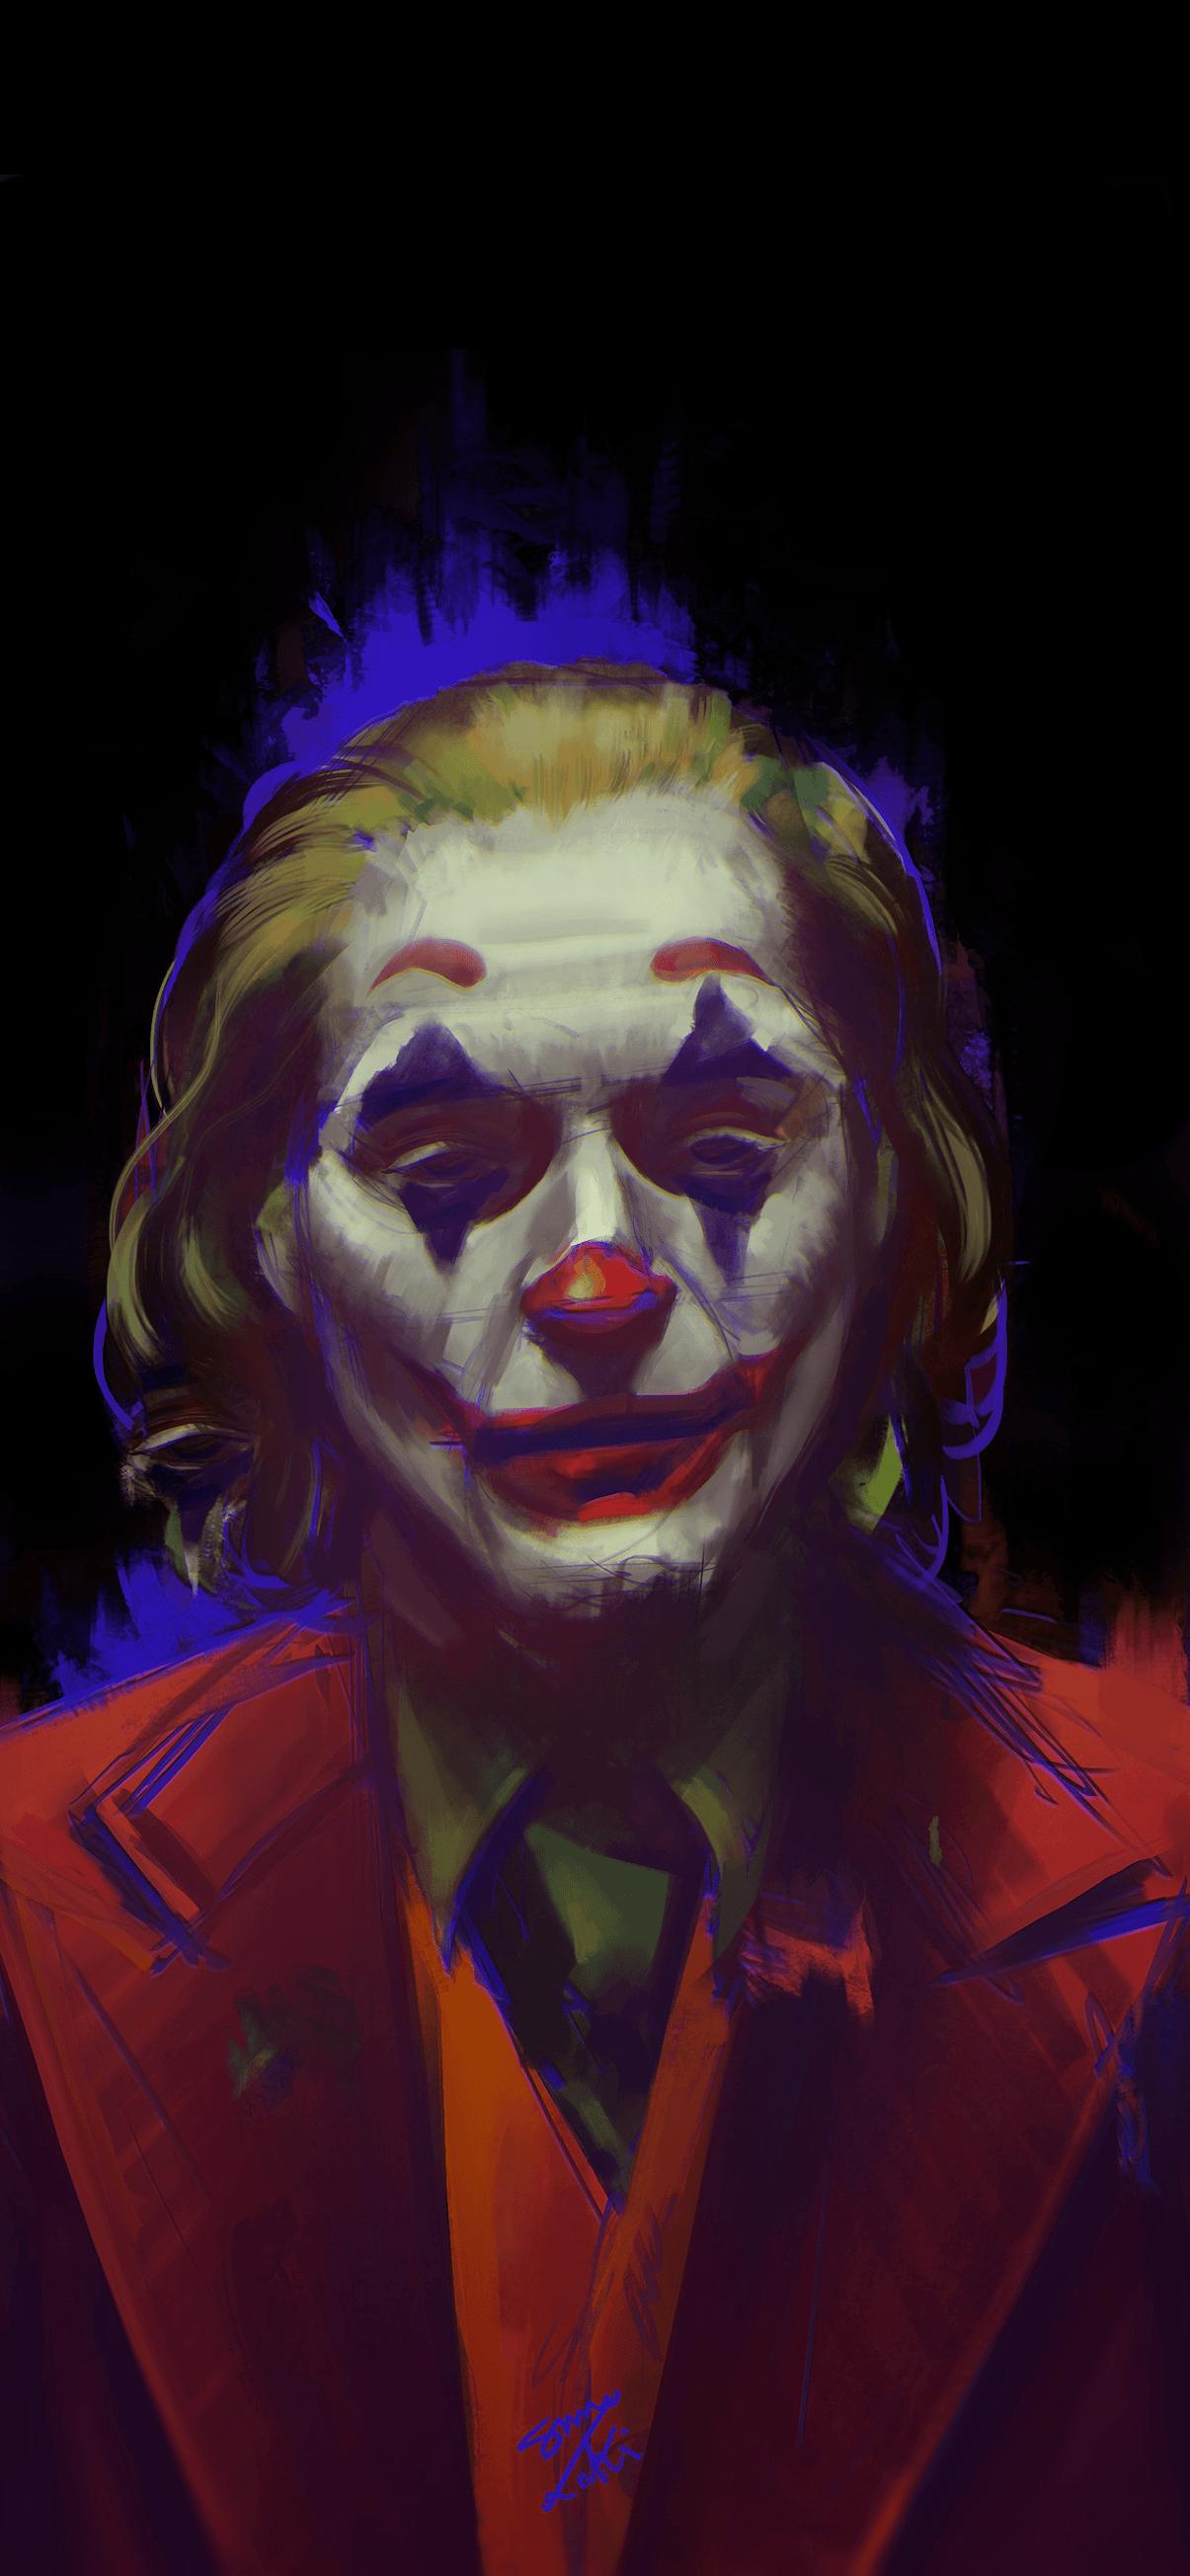 Joker For Phone Wallpapers Wallpaper Cave